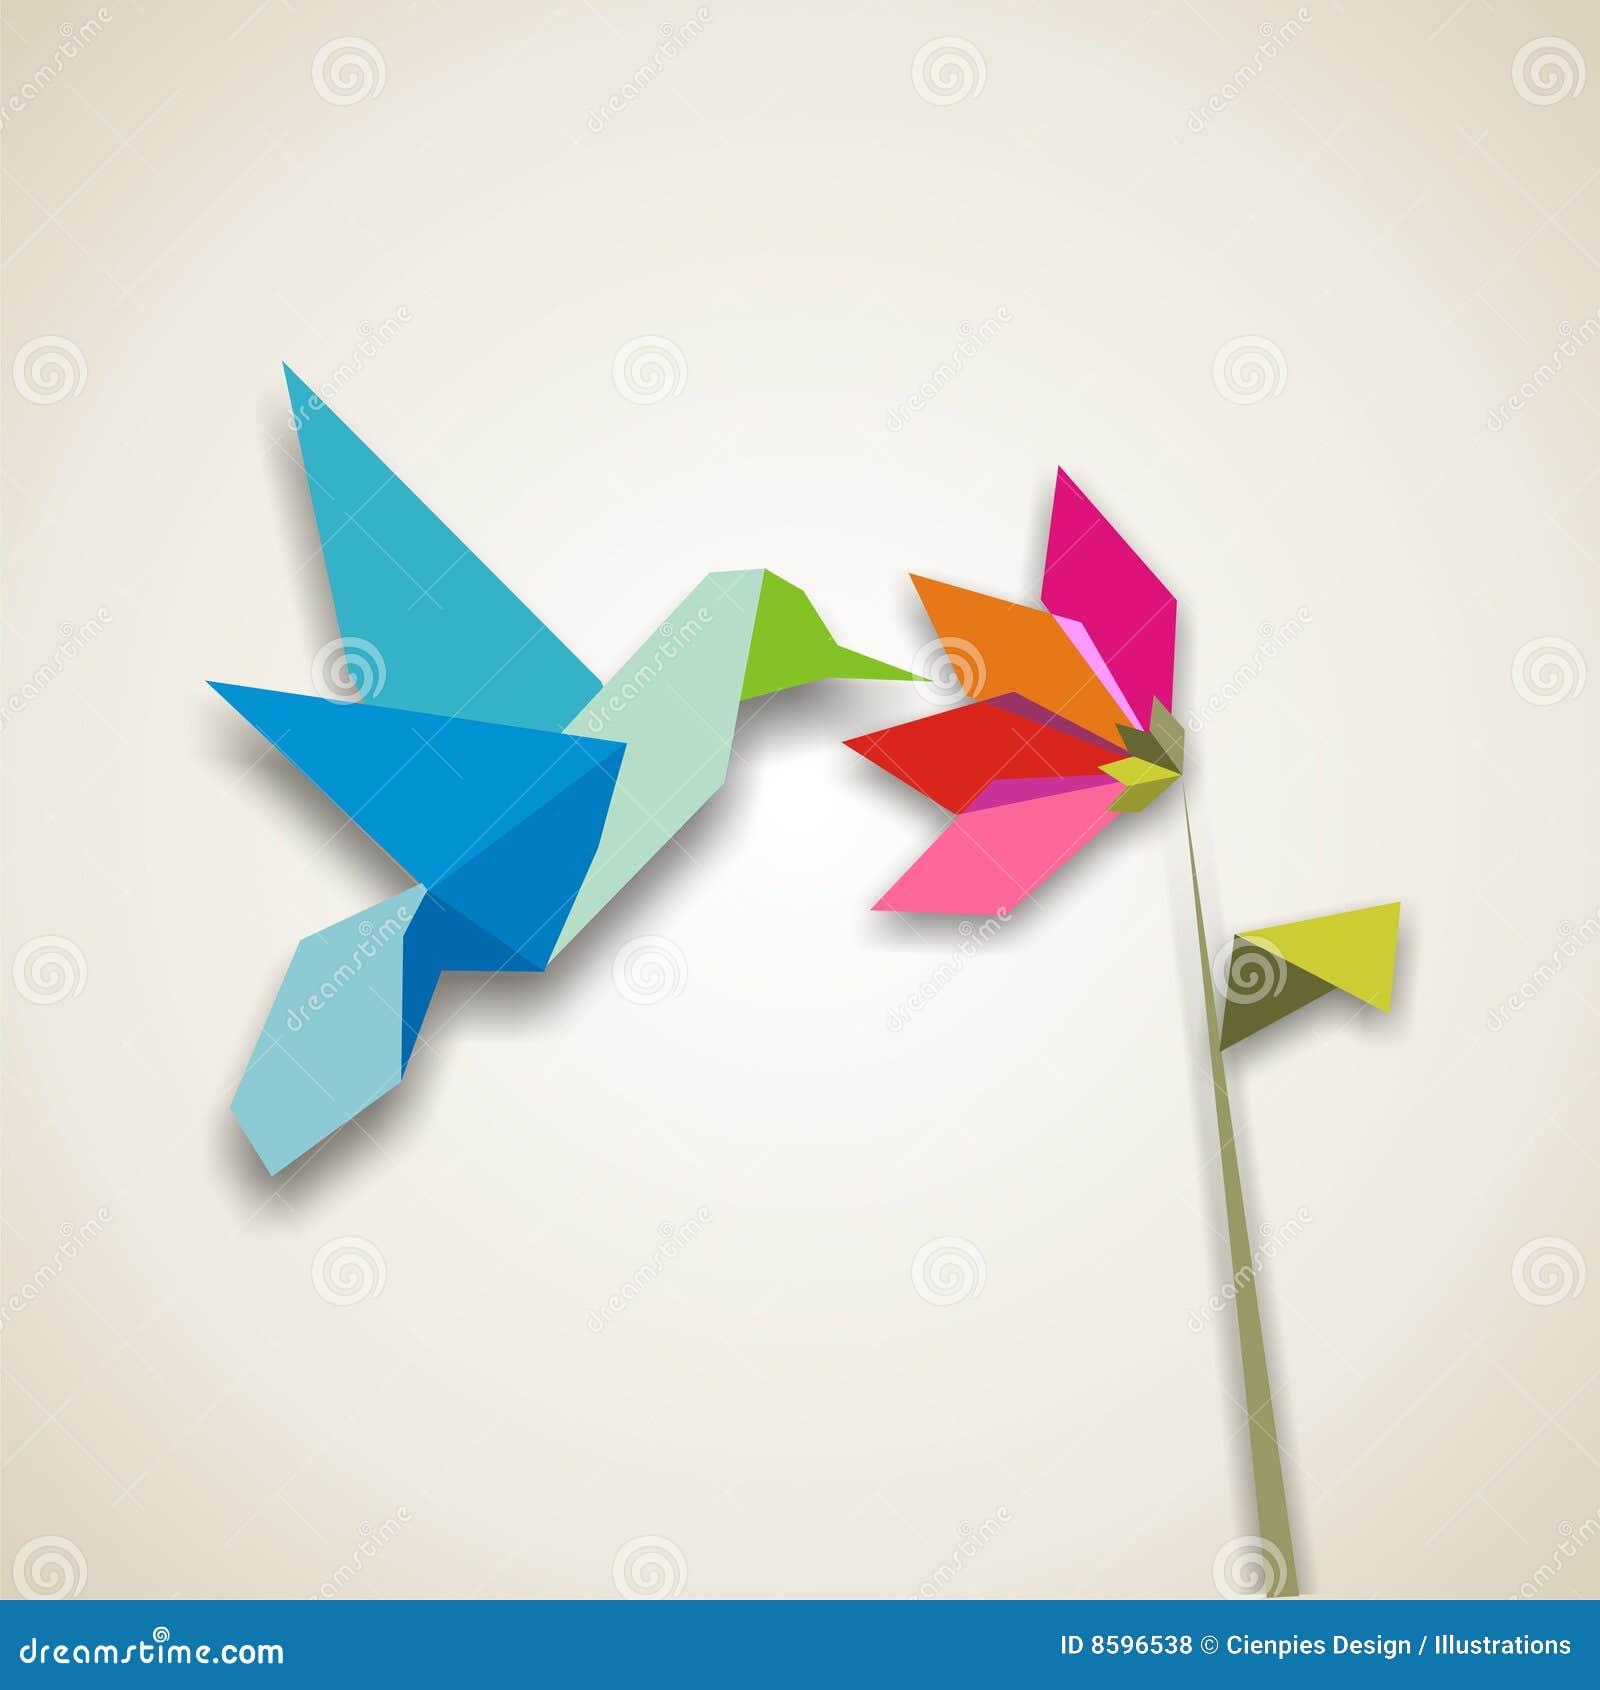 Origami hummingbird stock vector. Image of hummingbird ... - photo#30